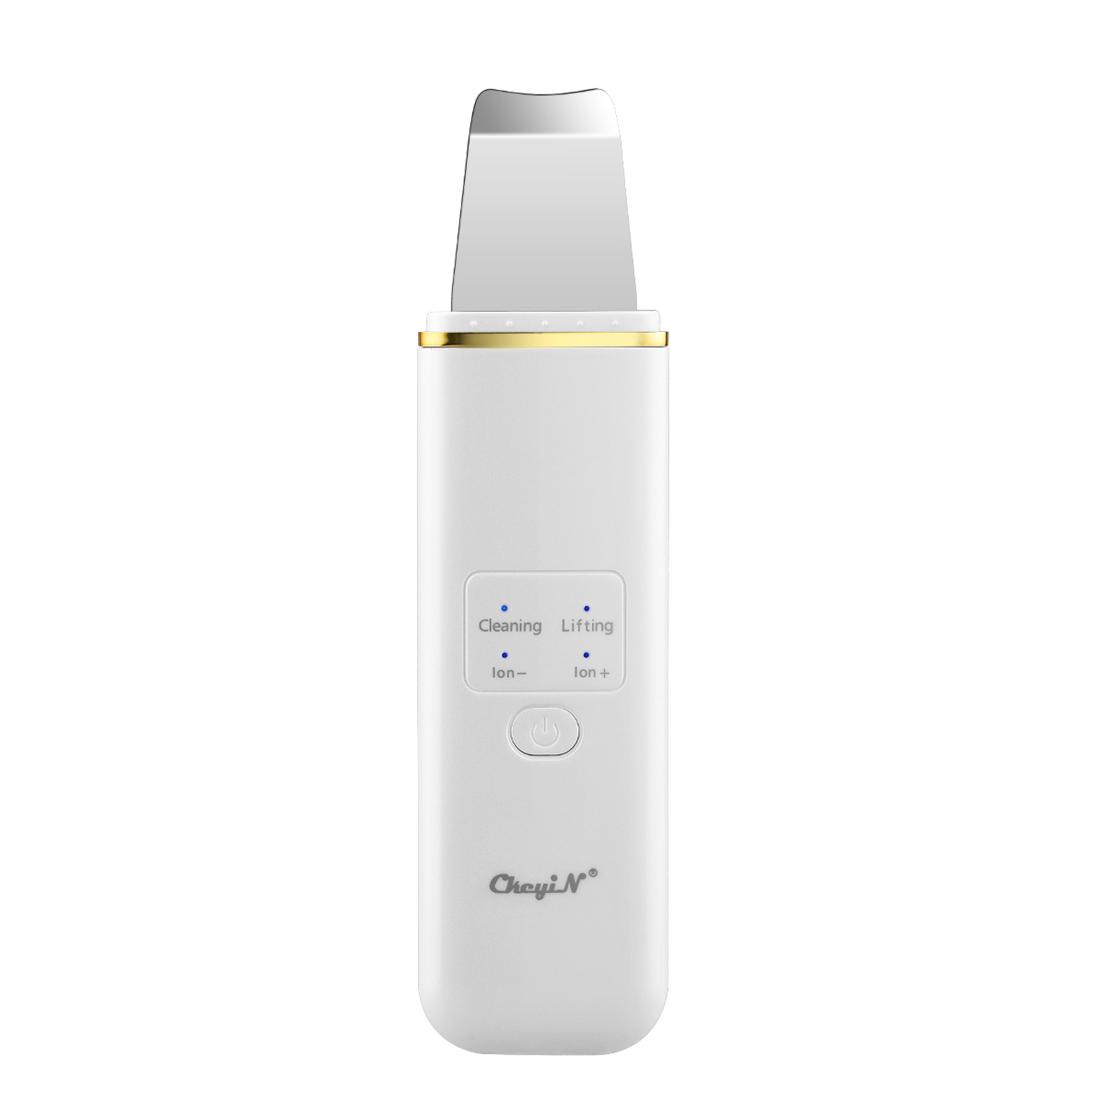 CkeyiN 초음파 필링기 얼굴 필링기 갈바닉 필링기 워터 필링기 EMS 미세 전류 USB